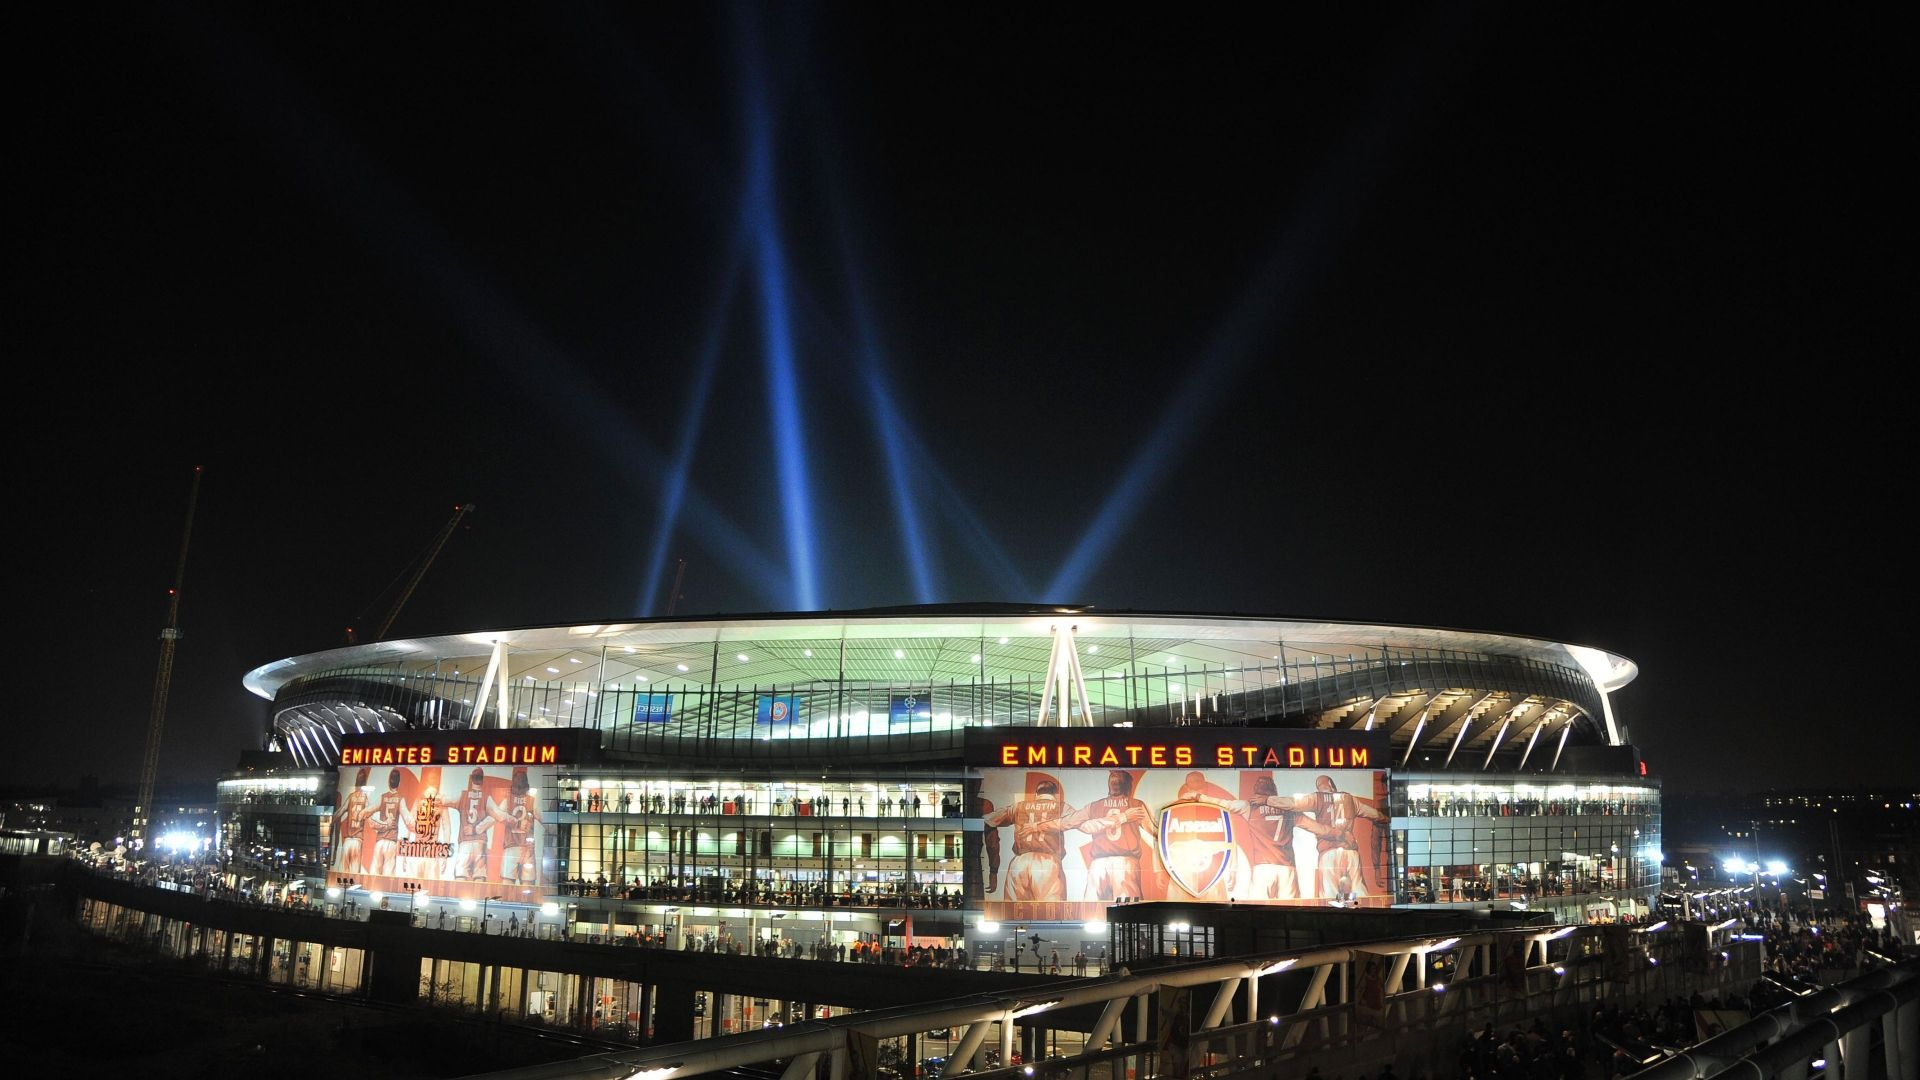 Emirates Stadium Download Wallpaper